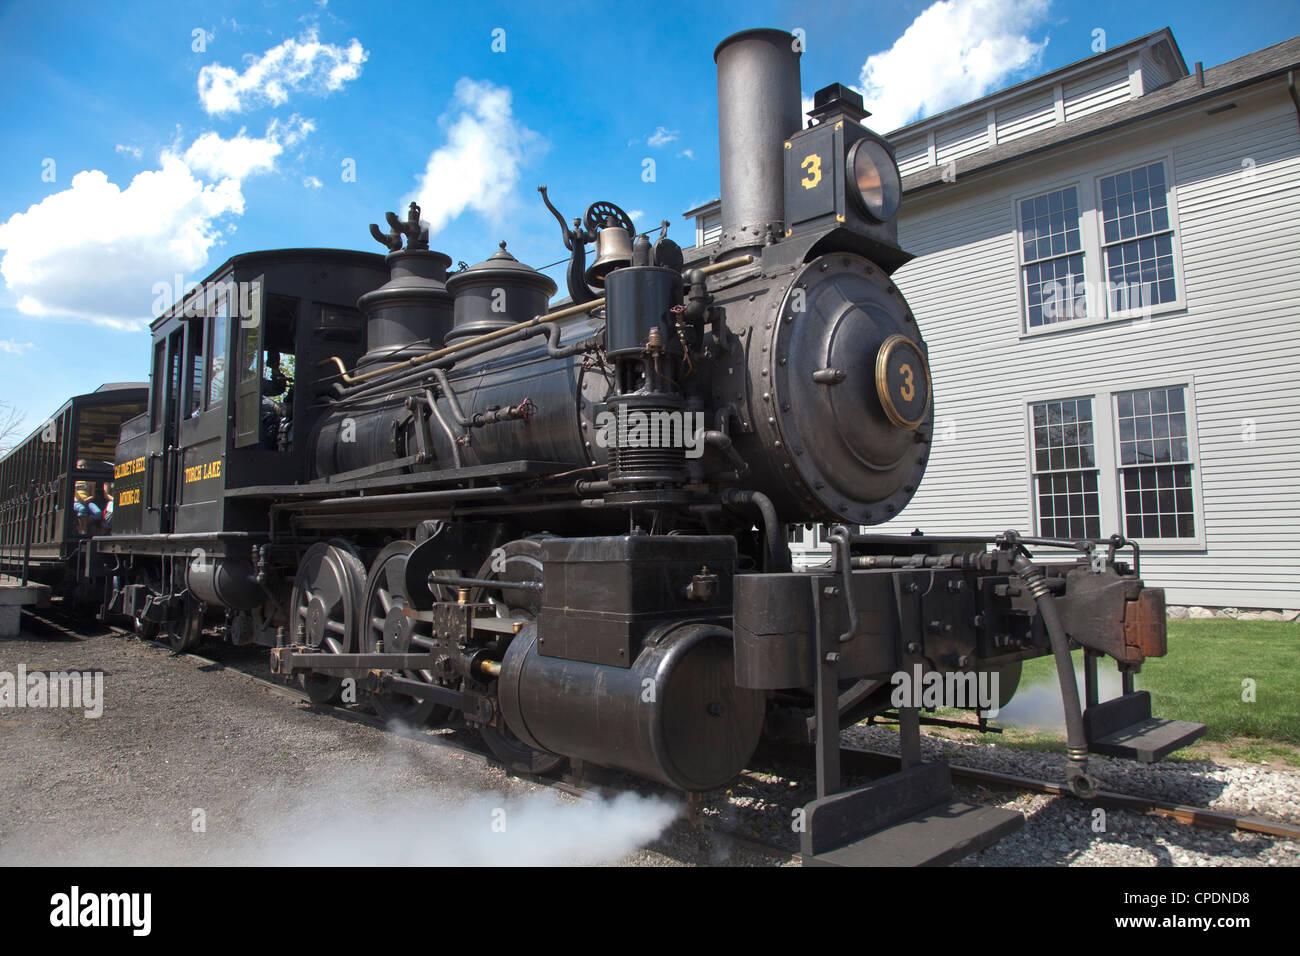 Steam locomotive at Greenfield Village, Dearborn, Michigan - Stock Image